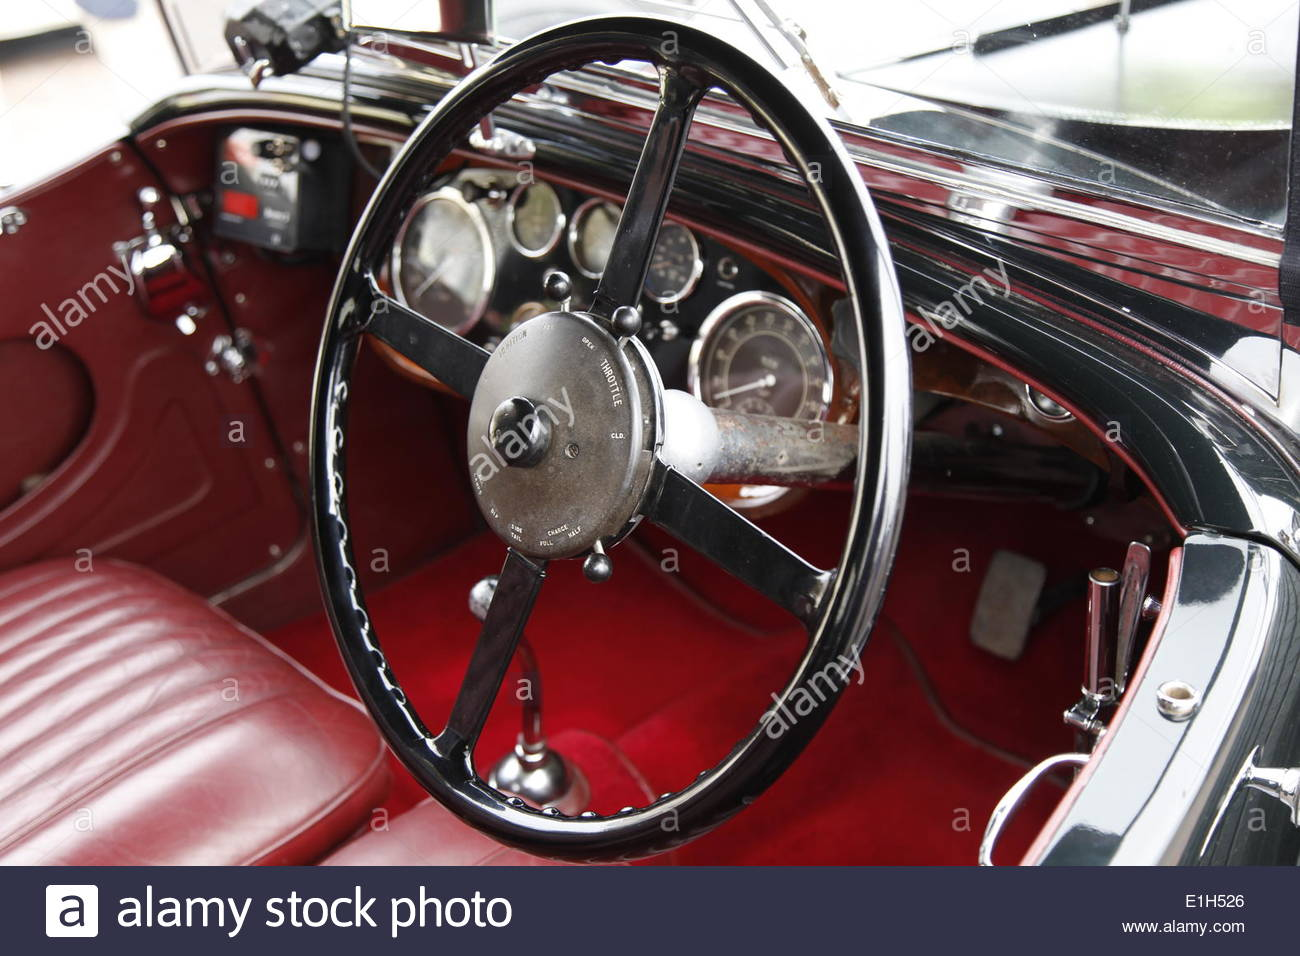 bentley classic car interior stock photos bentley. Black Bedroom Furniture Sets. Home Design Ideas